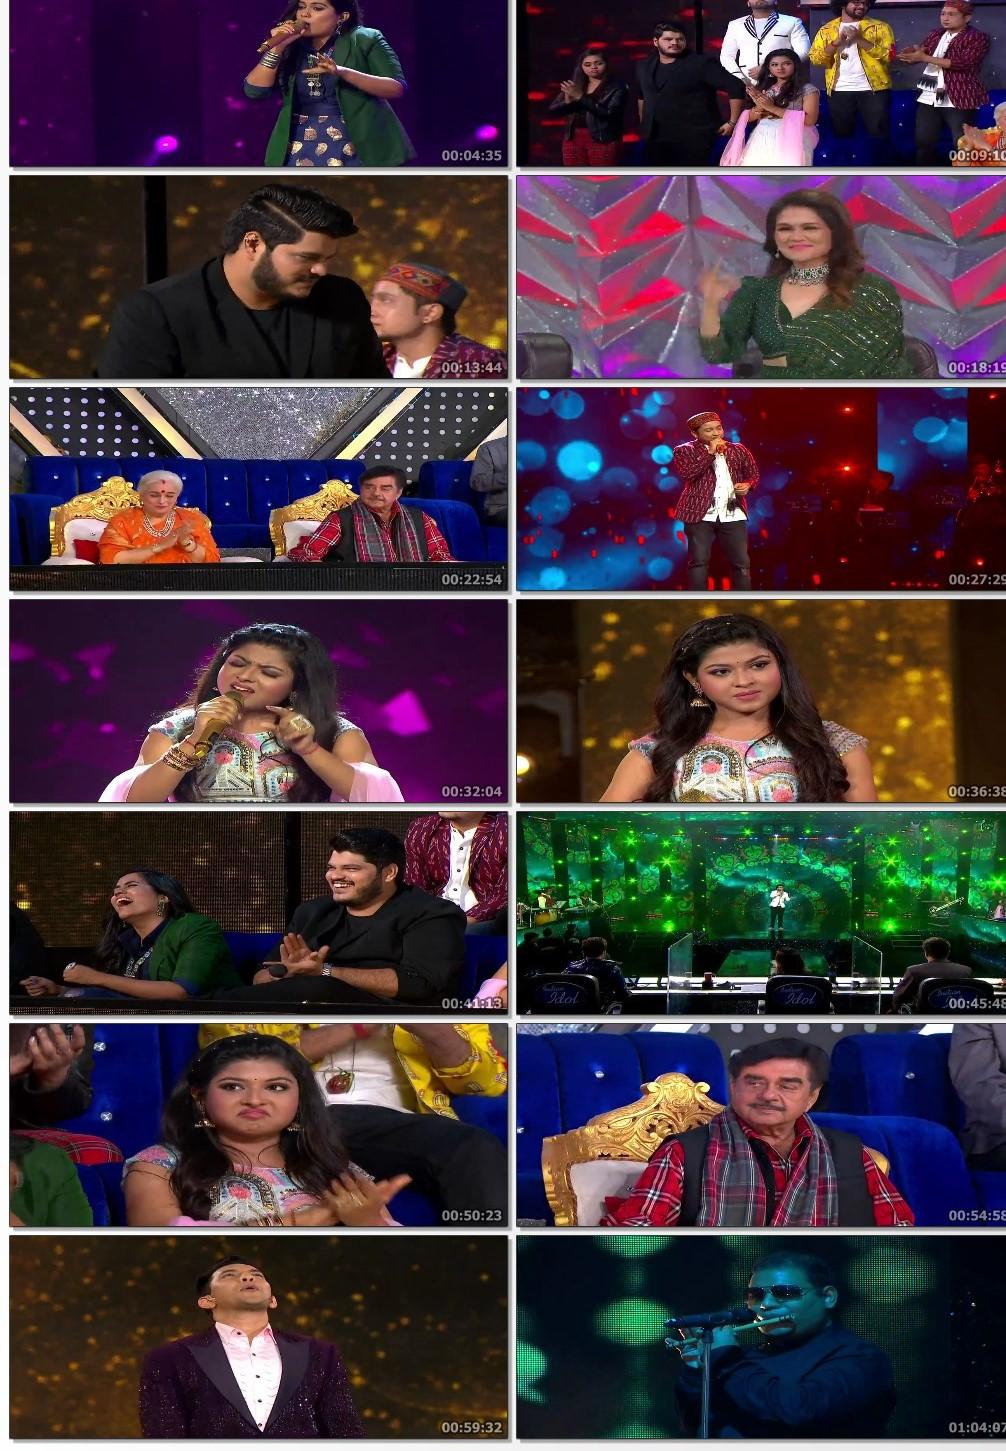 Indian-Idol-S12-4-July-2021-ow-720p-HDRip-470-MB-mkv-thumbs316226cdf75e66d9